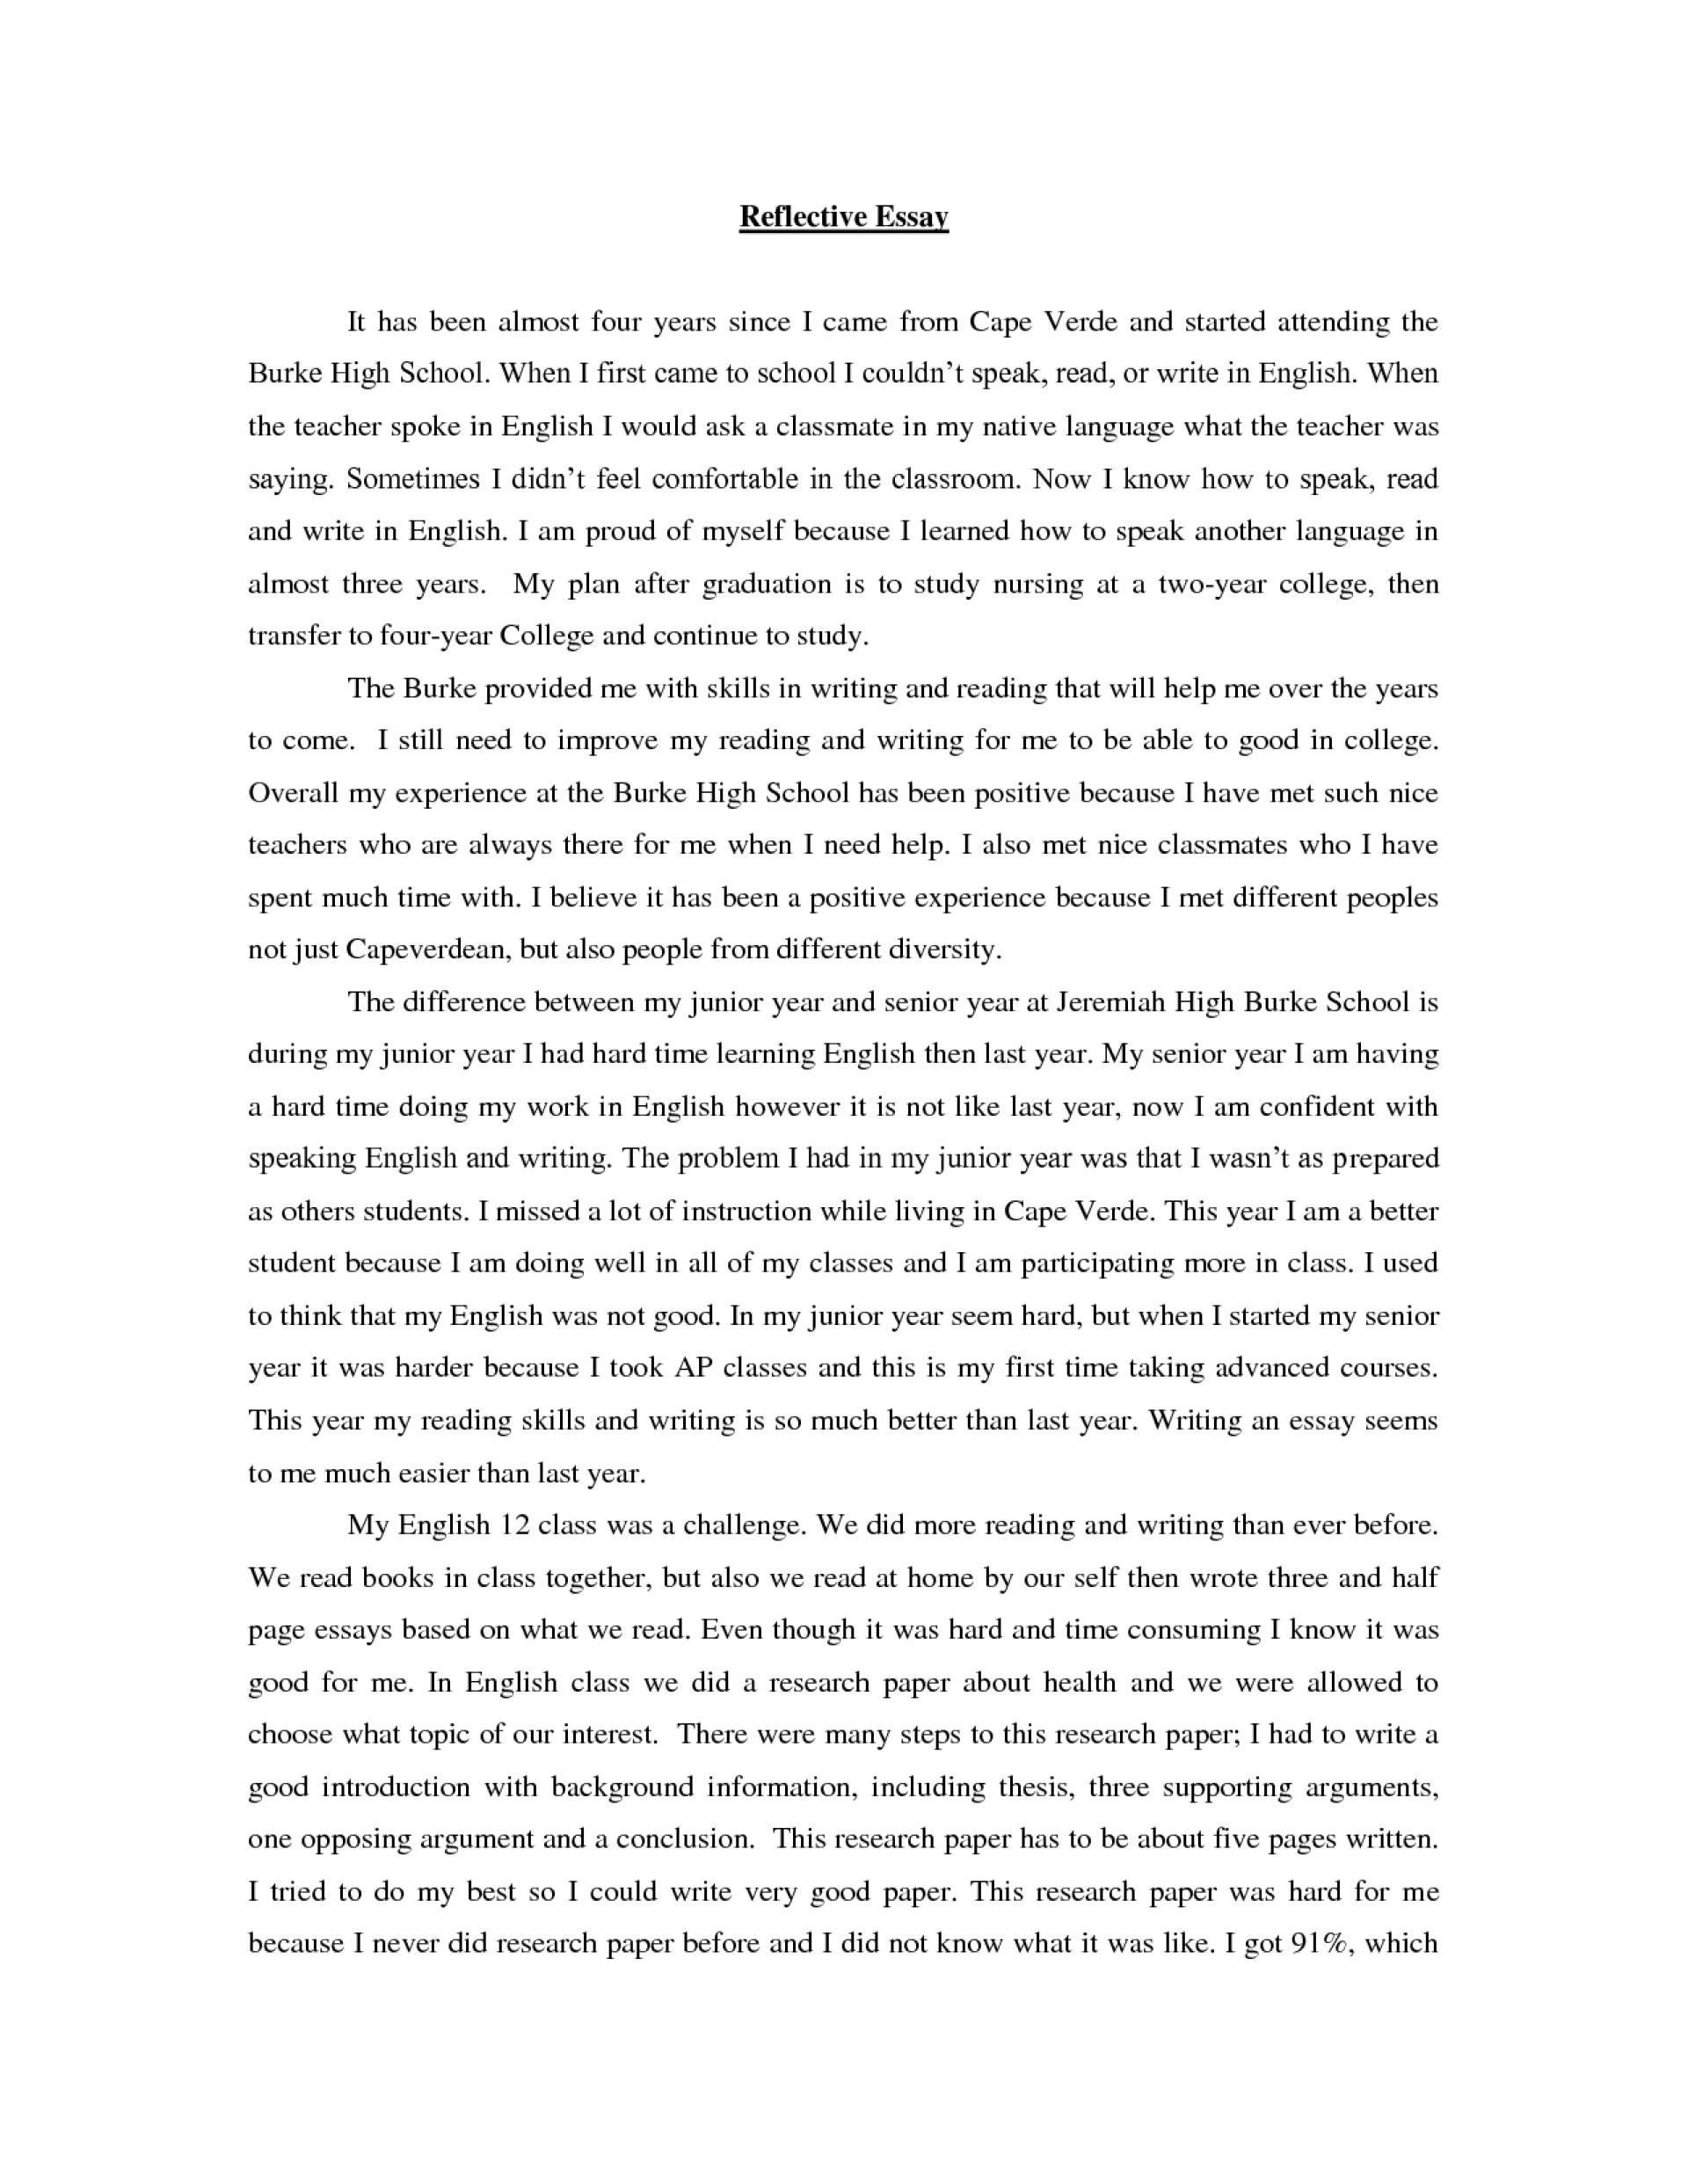 Reflective nursing essay examples